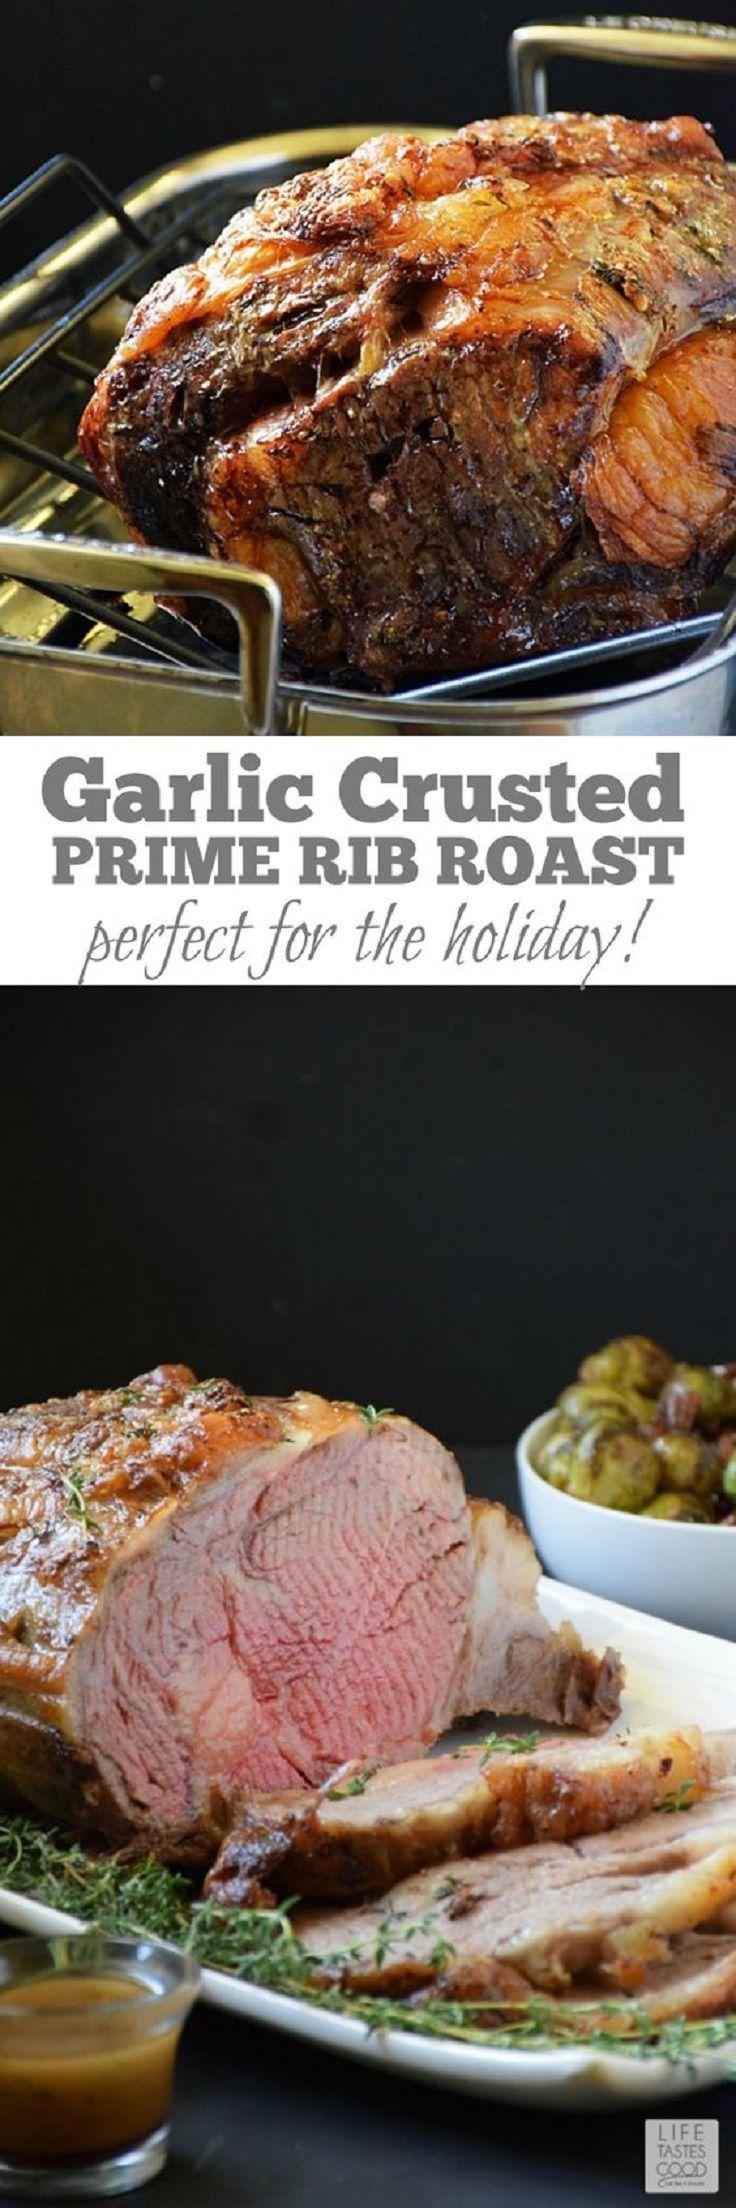 Garlic Crusted Prime Rib Roast - 17 Easter Dinner Ideas for an Everlasting Family Feast